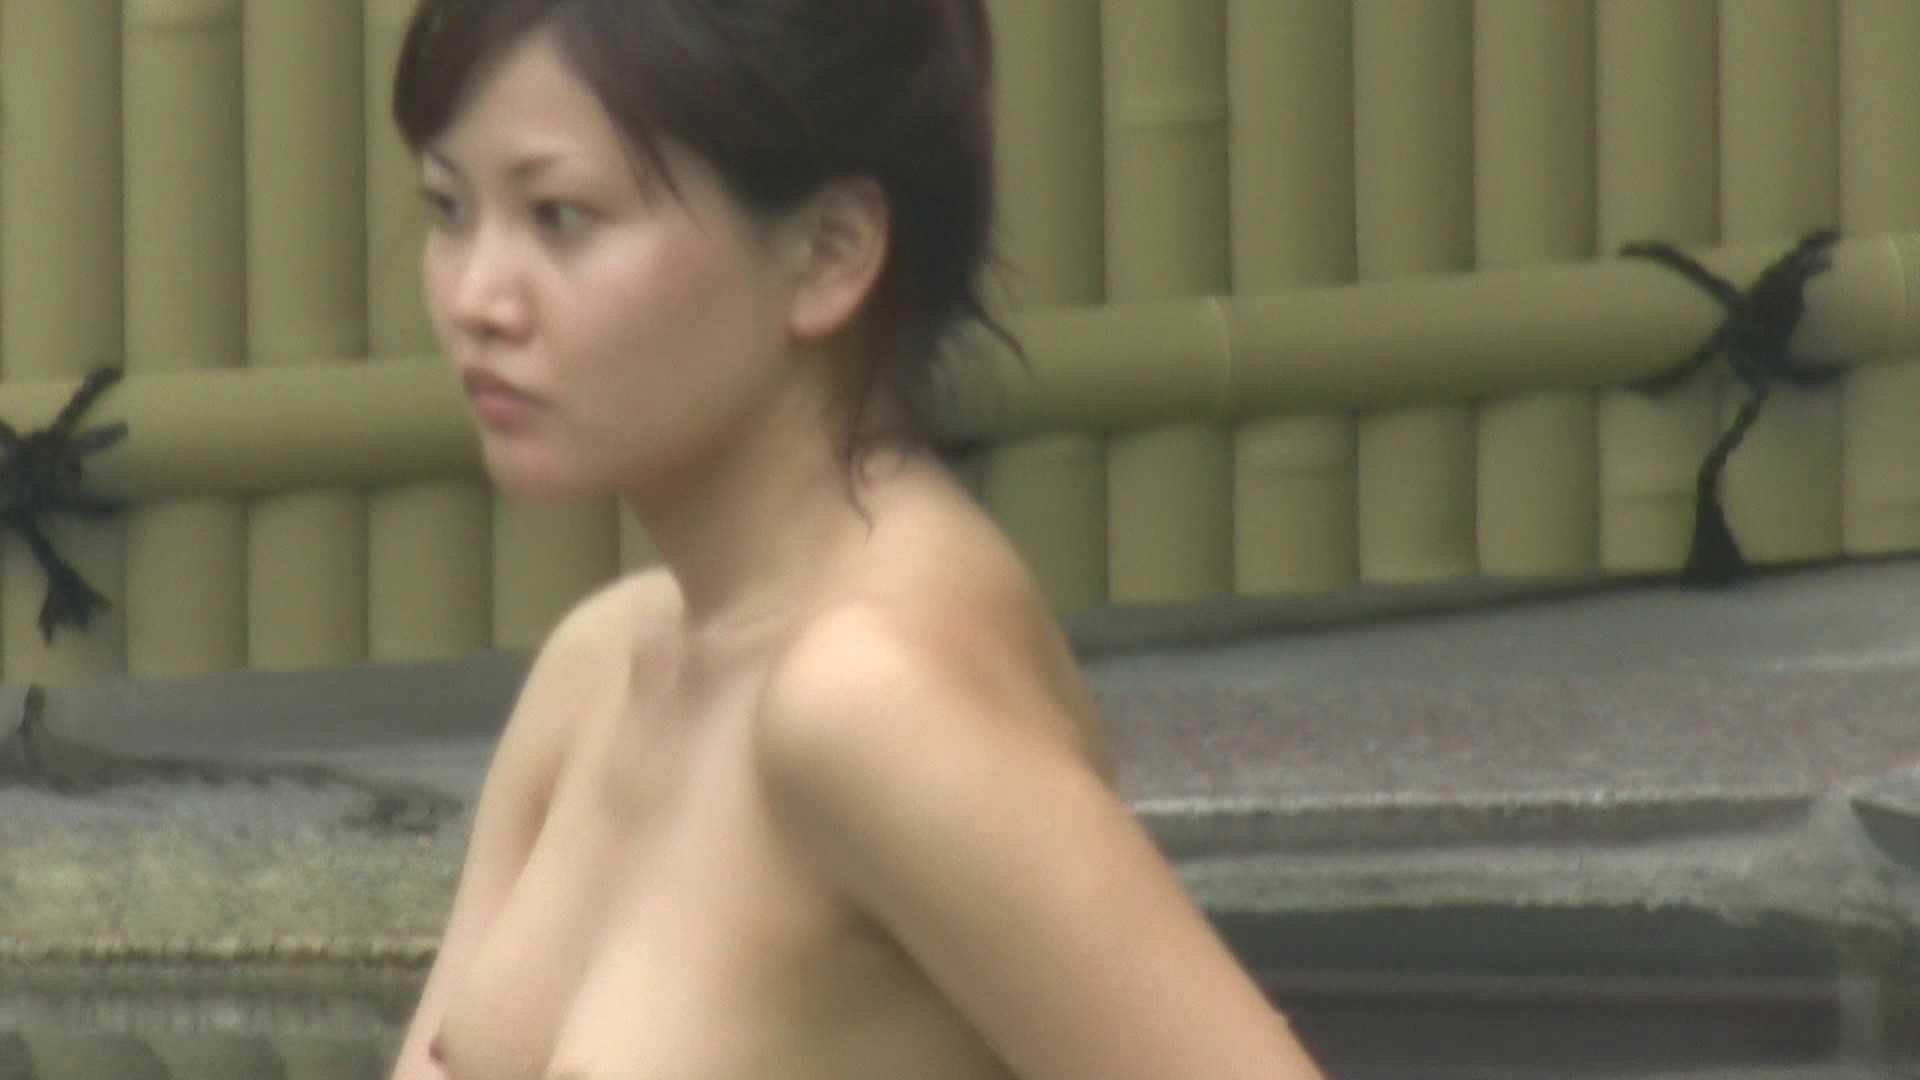 Aquaな露天風呂Vol.125 0 | 0  26連発 21